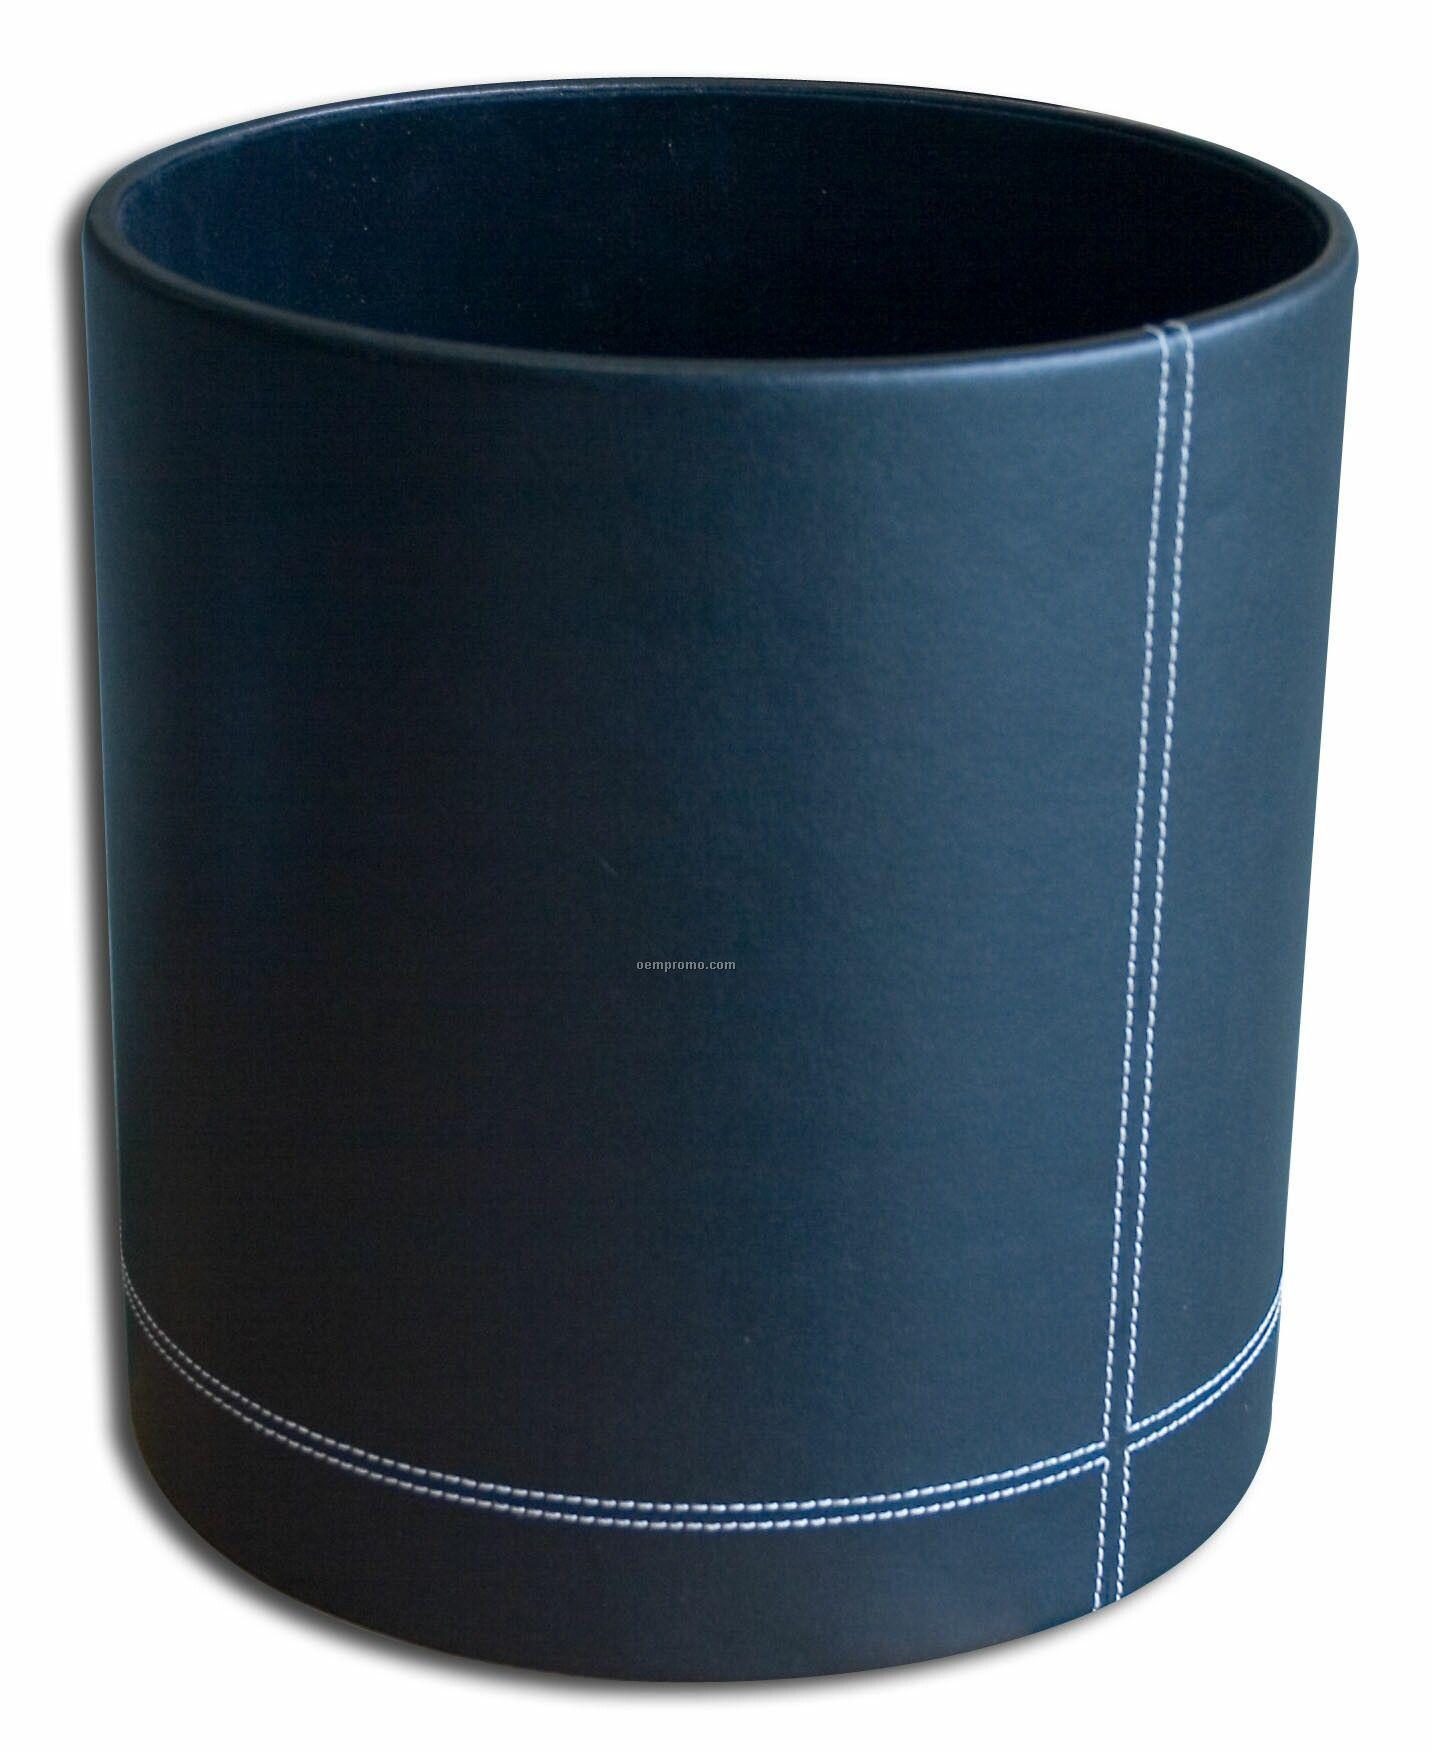 Black Eco-friendly Leather Round Waste Basket